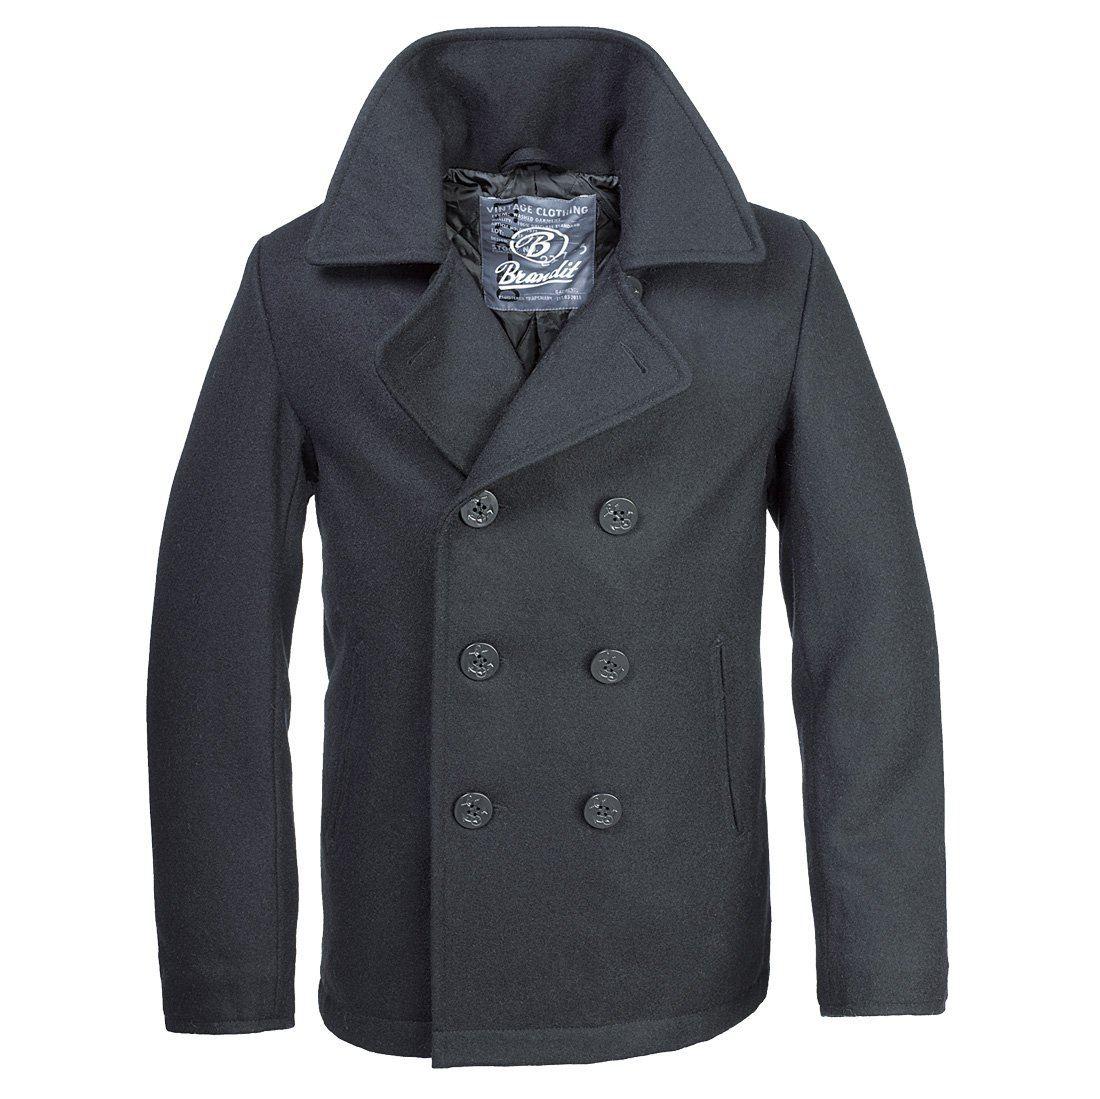 Mens Vintage Jackets at Vintage Clothing